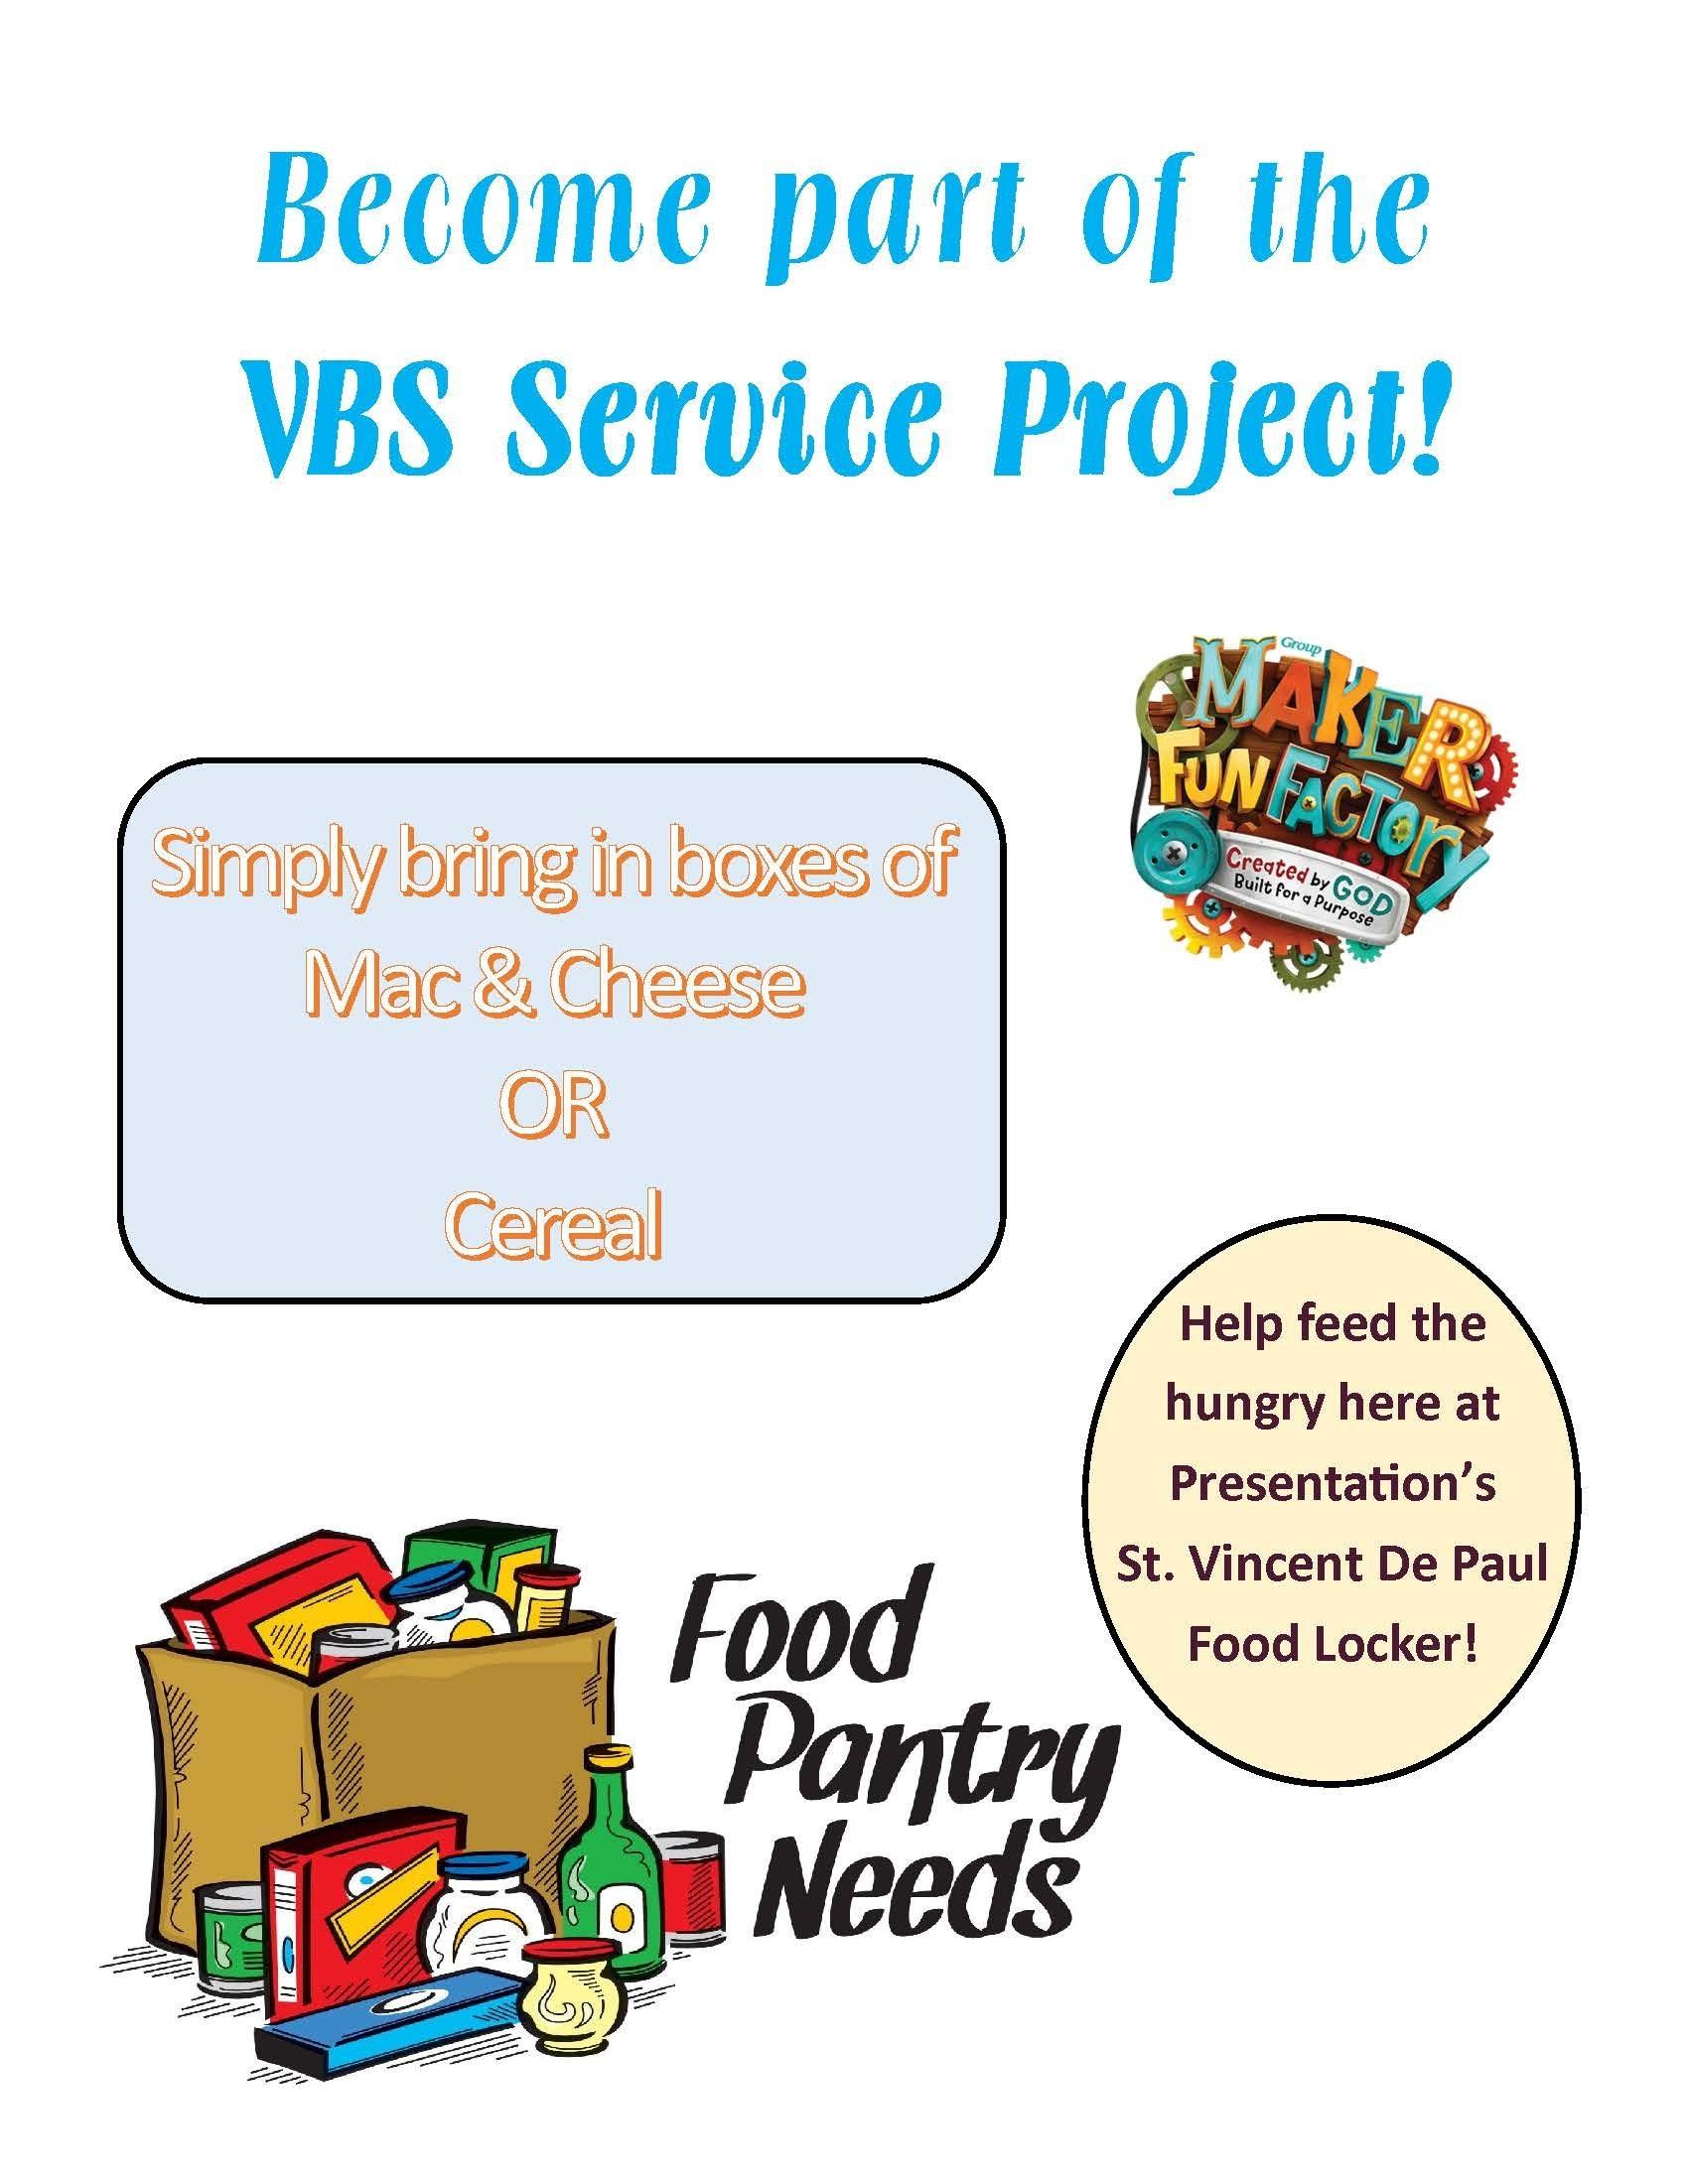 Vbs Social Justice Flyer